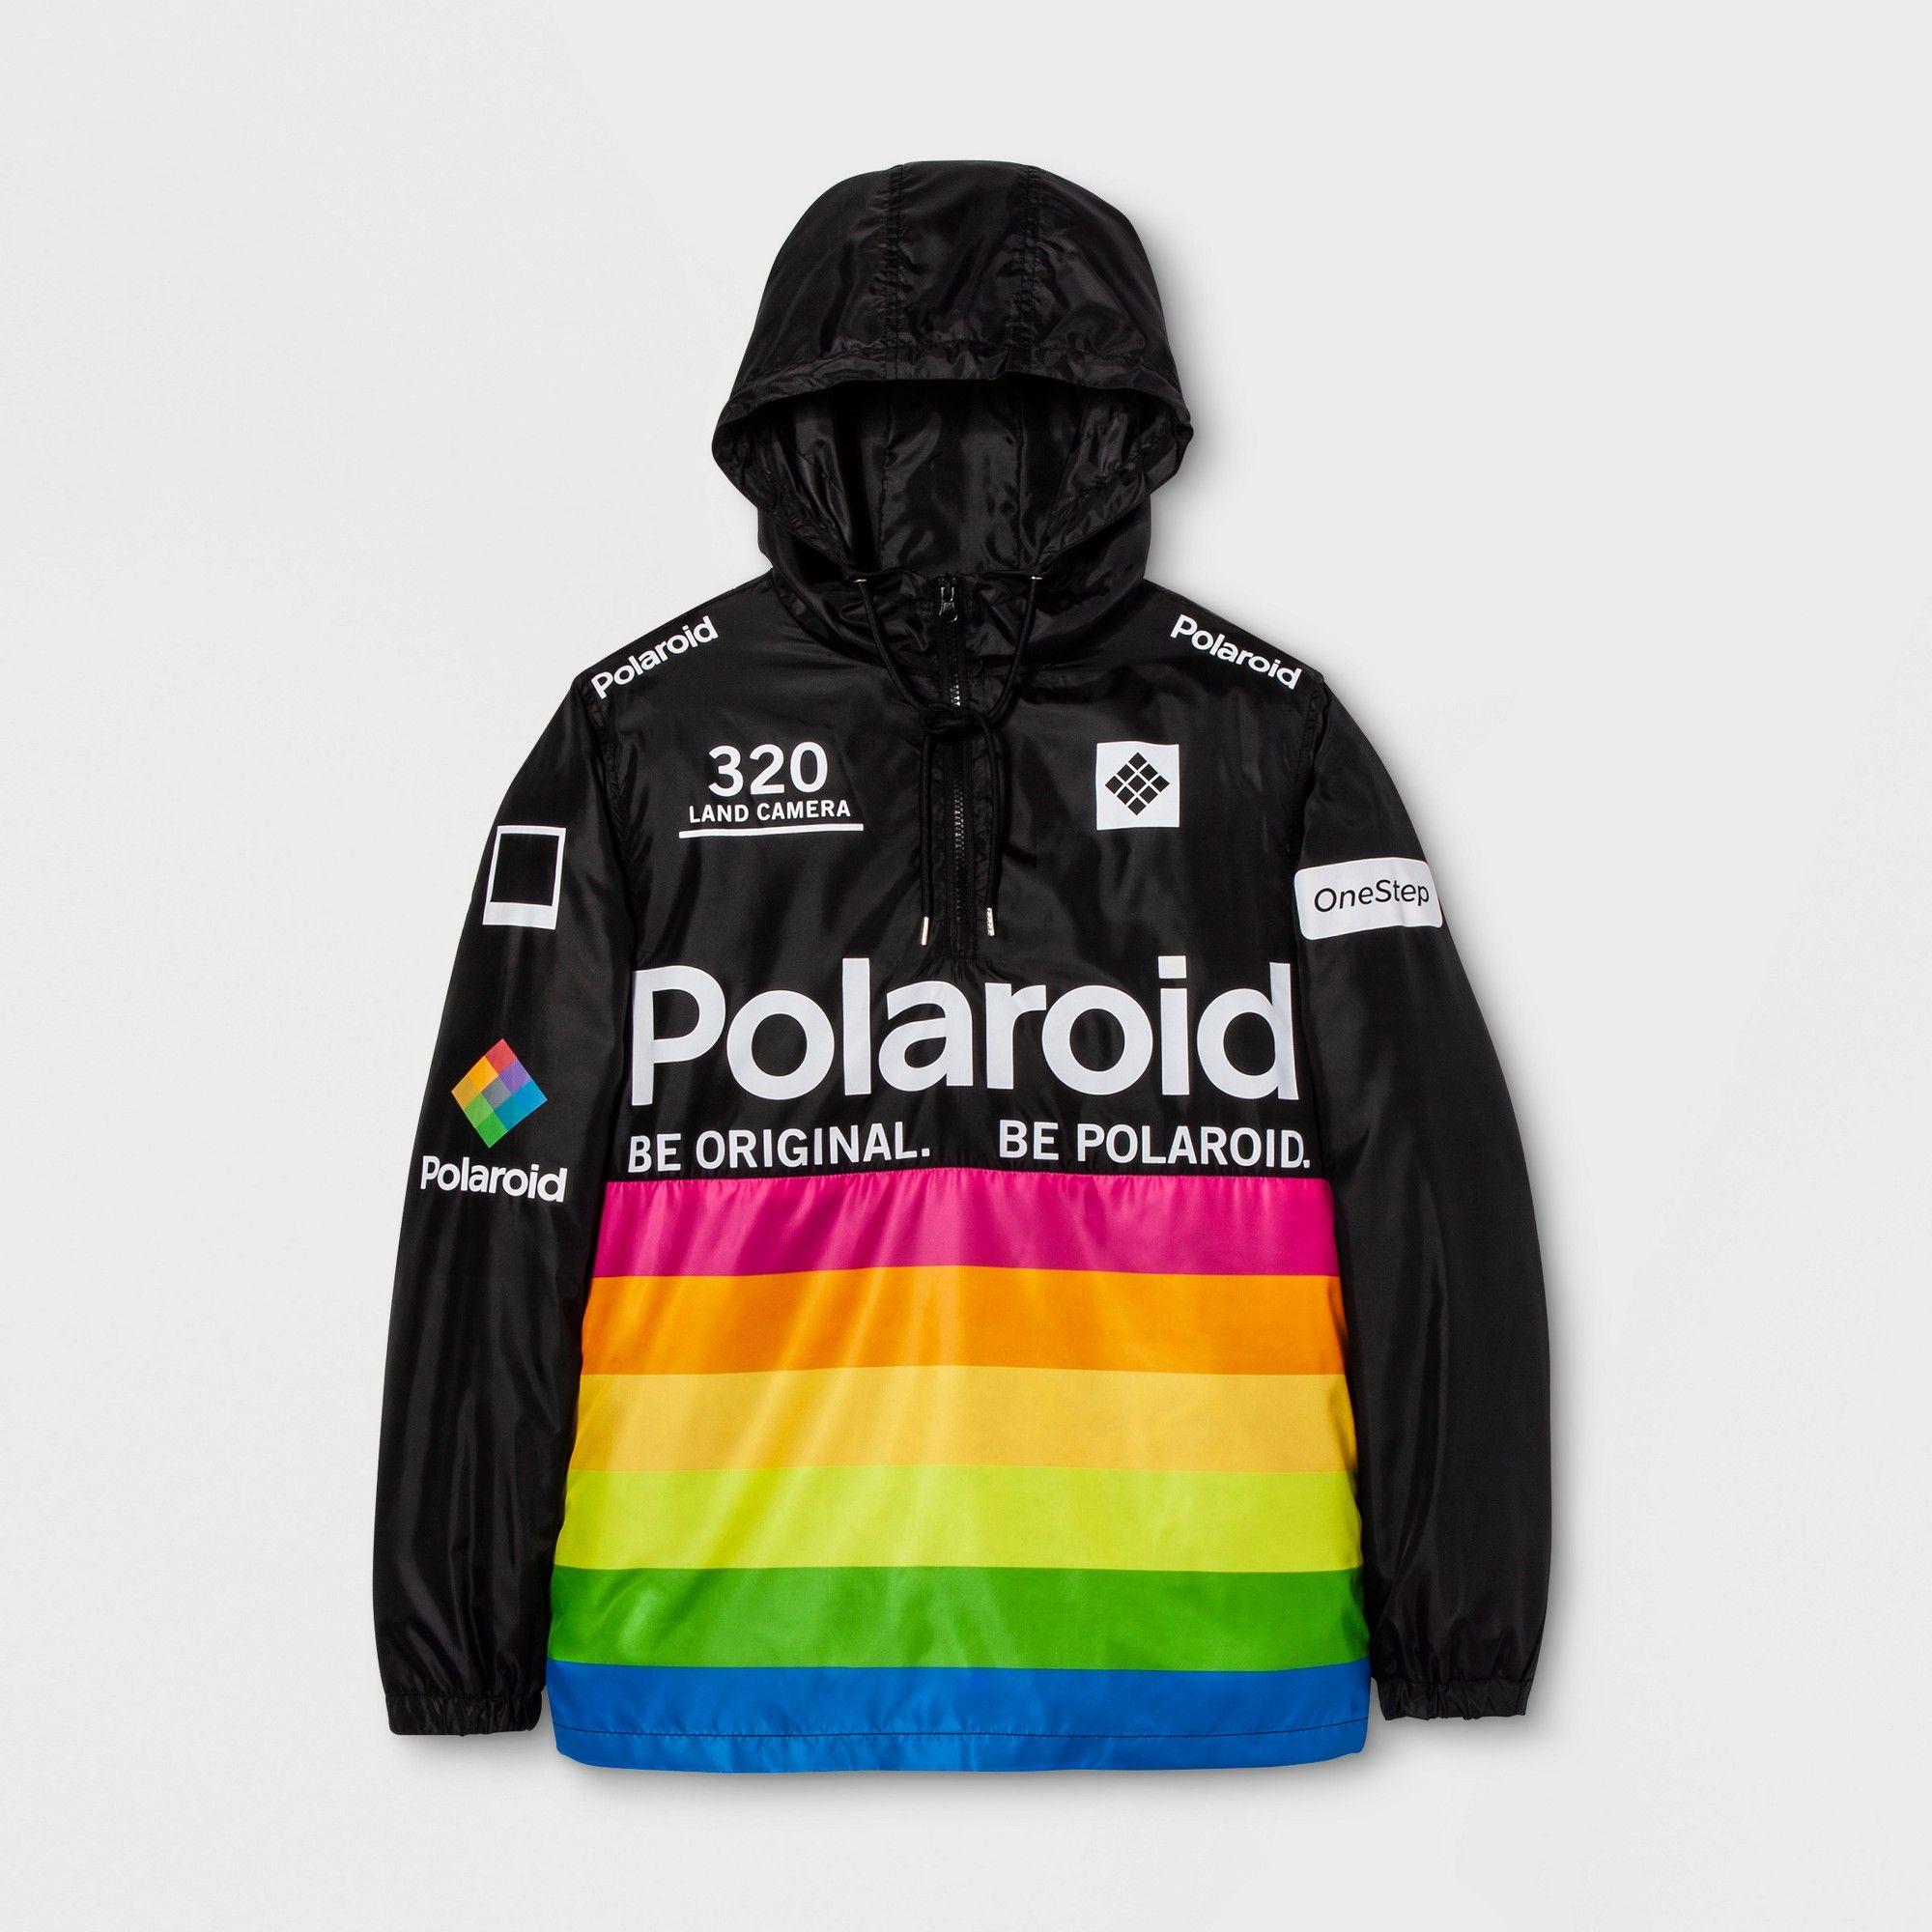 5c0afa04f Men's Long Sleeve Polaroid Hooded Pullover Anorak Jacket - Black 2XL ...